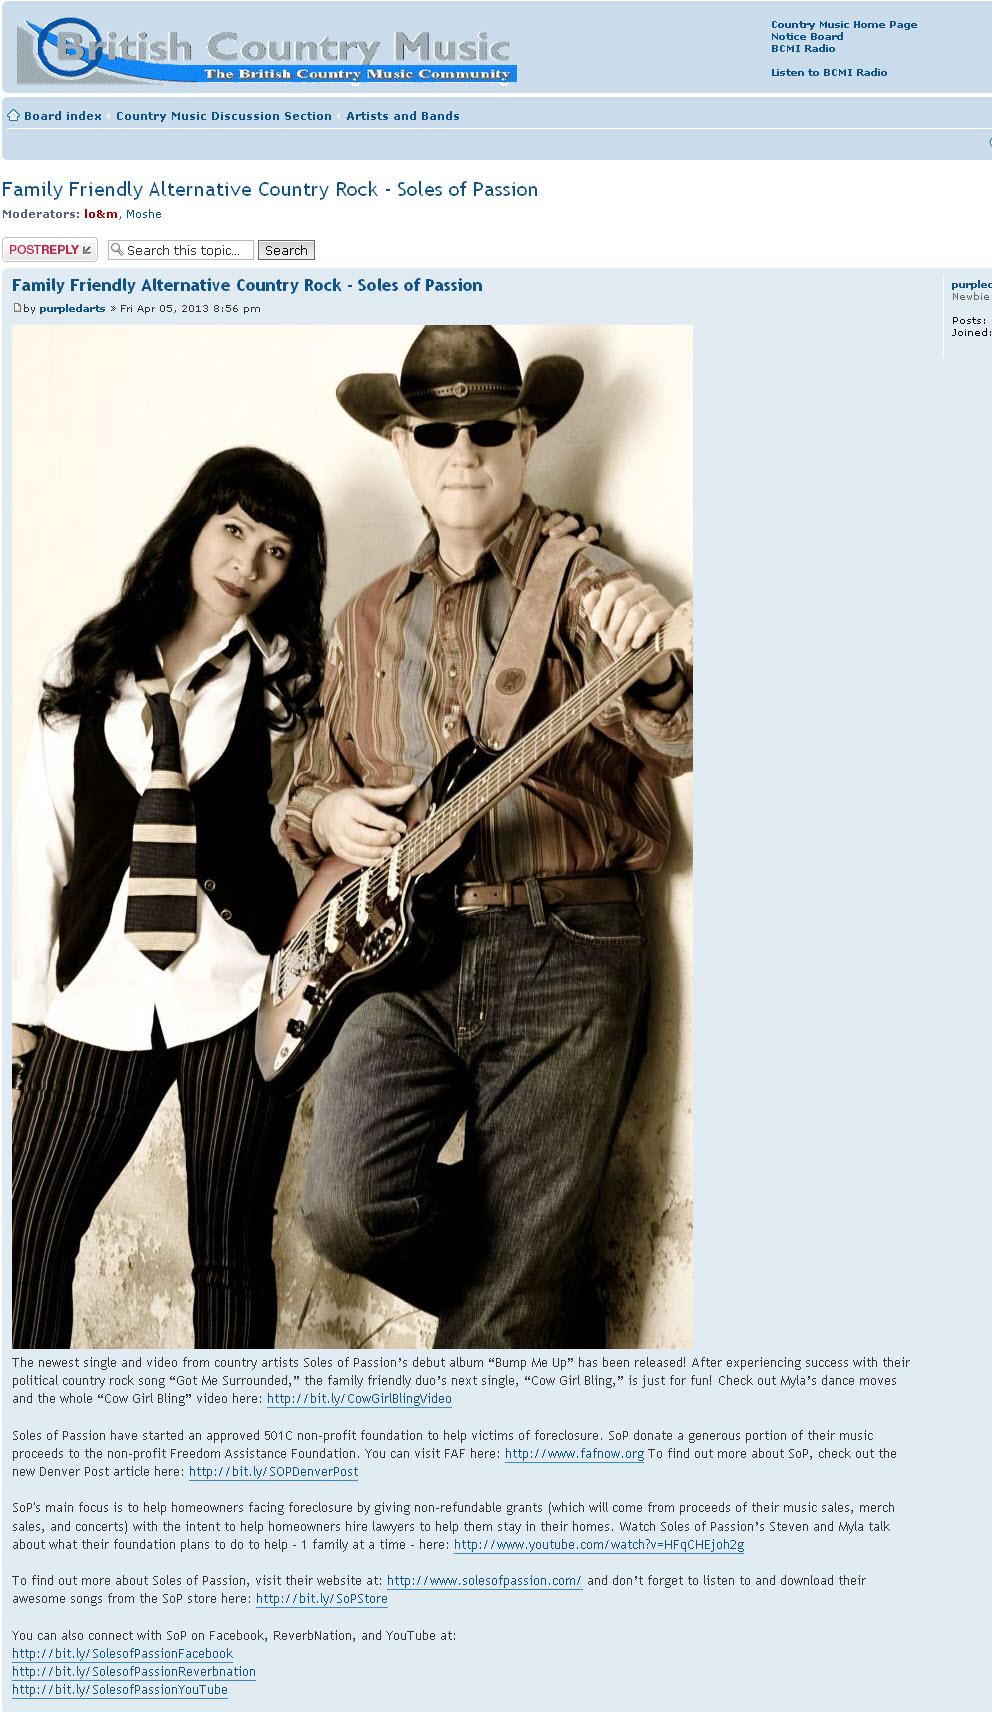 Blog Post on British Country Music